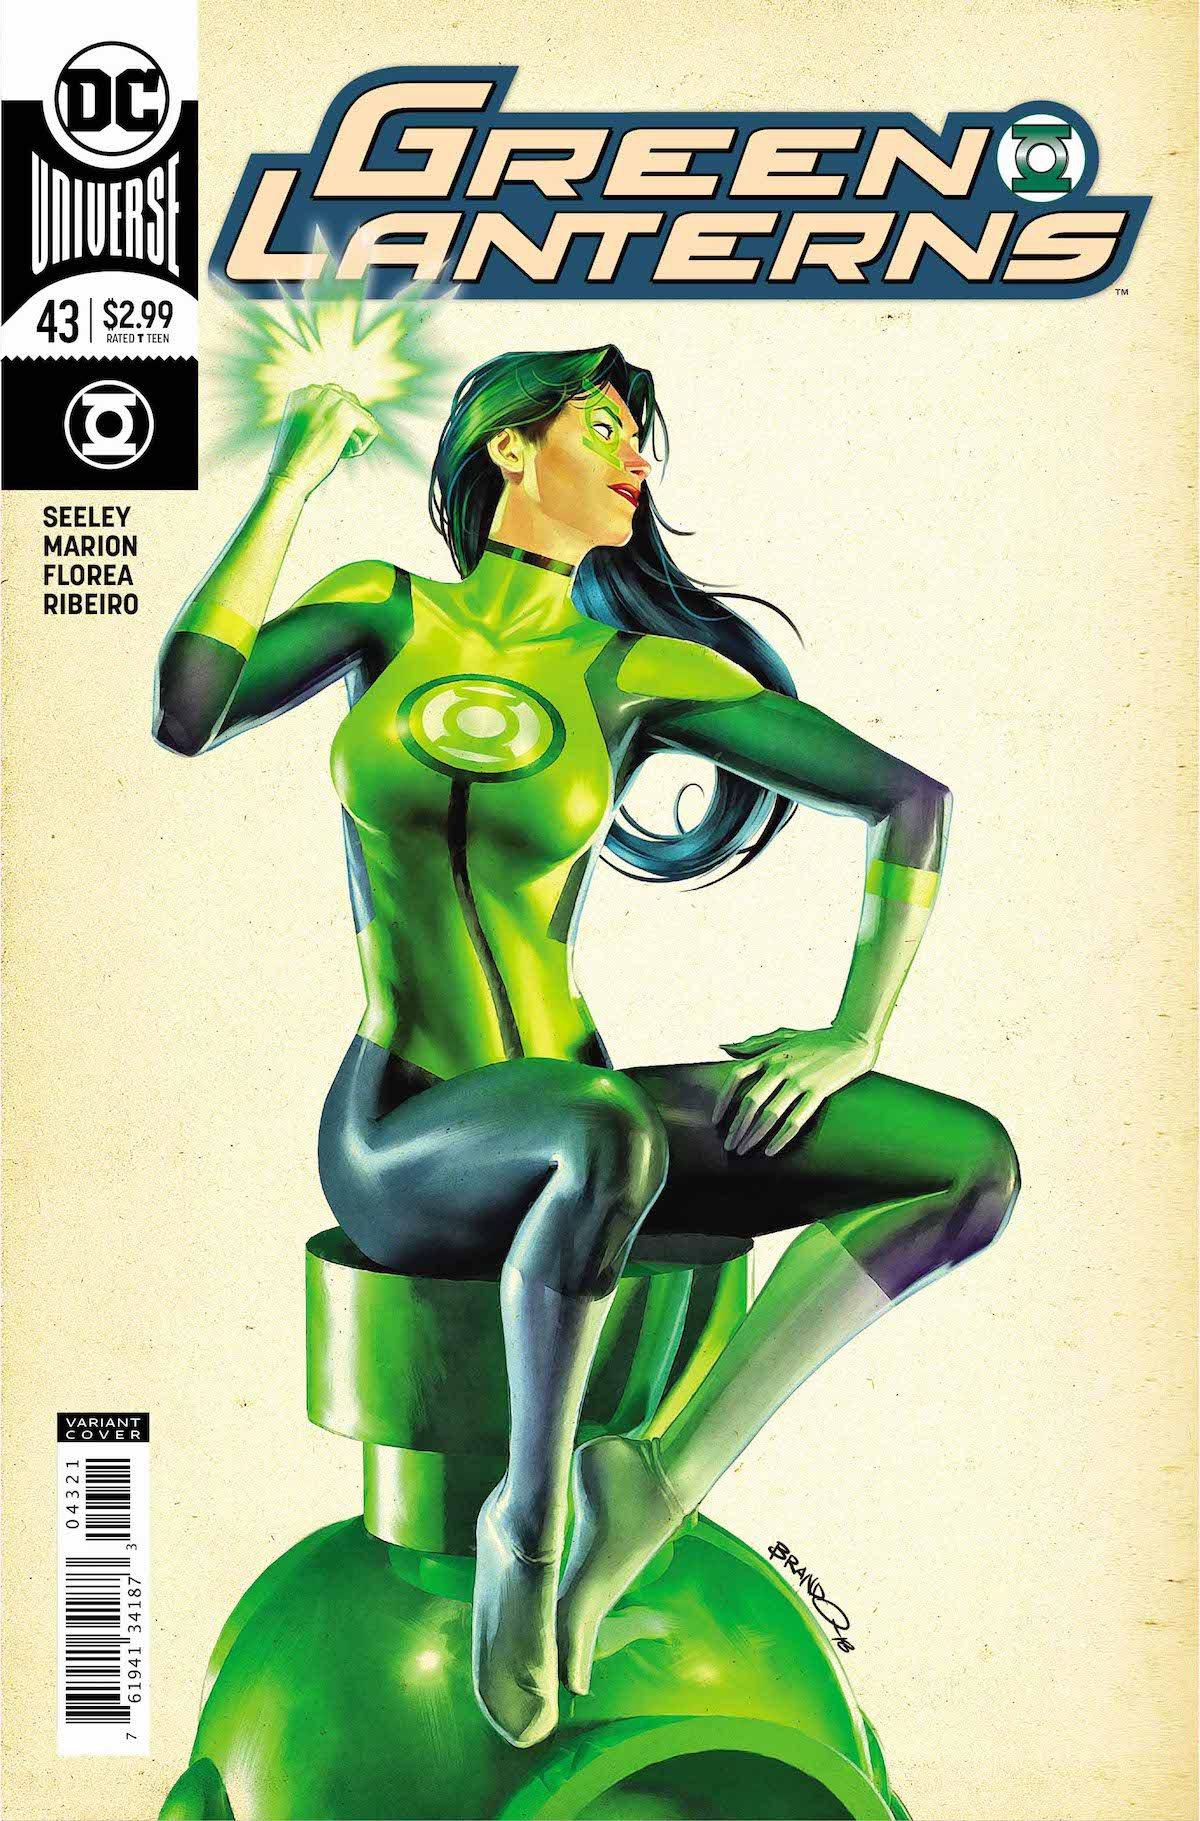 Green Lanterns #43 variant cover